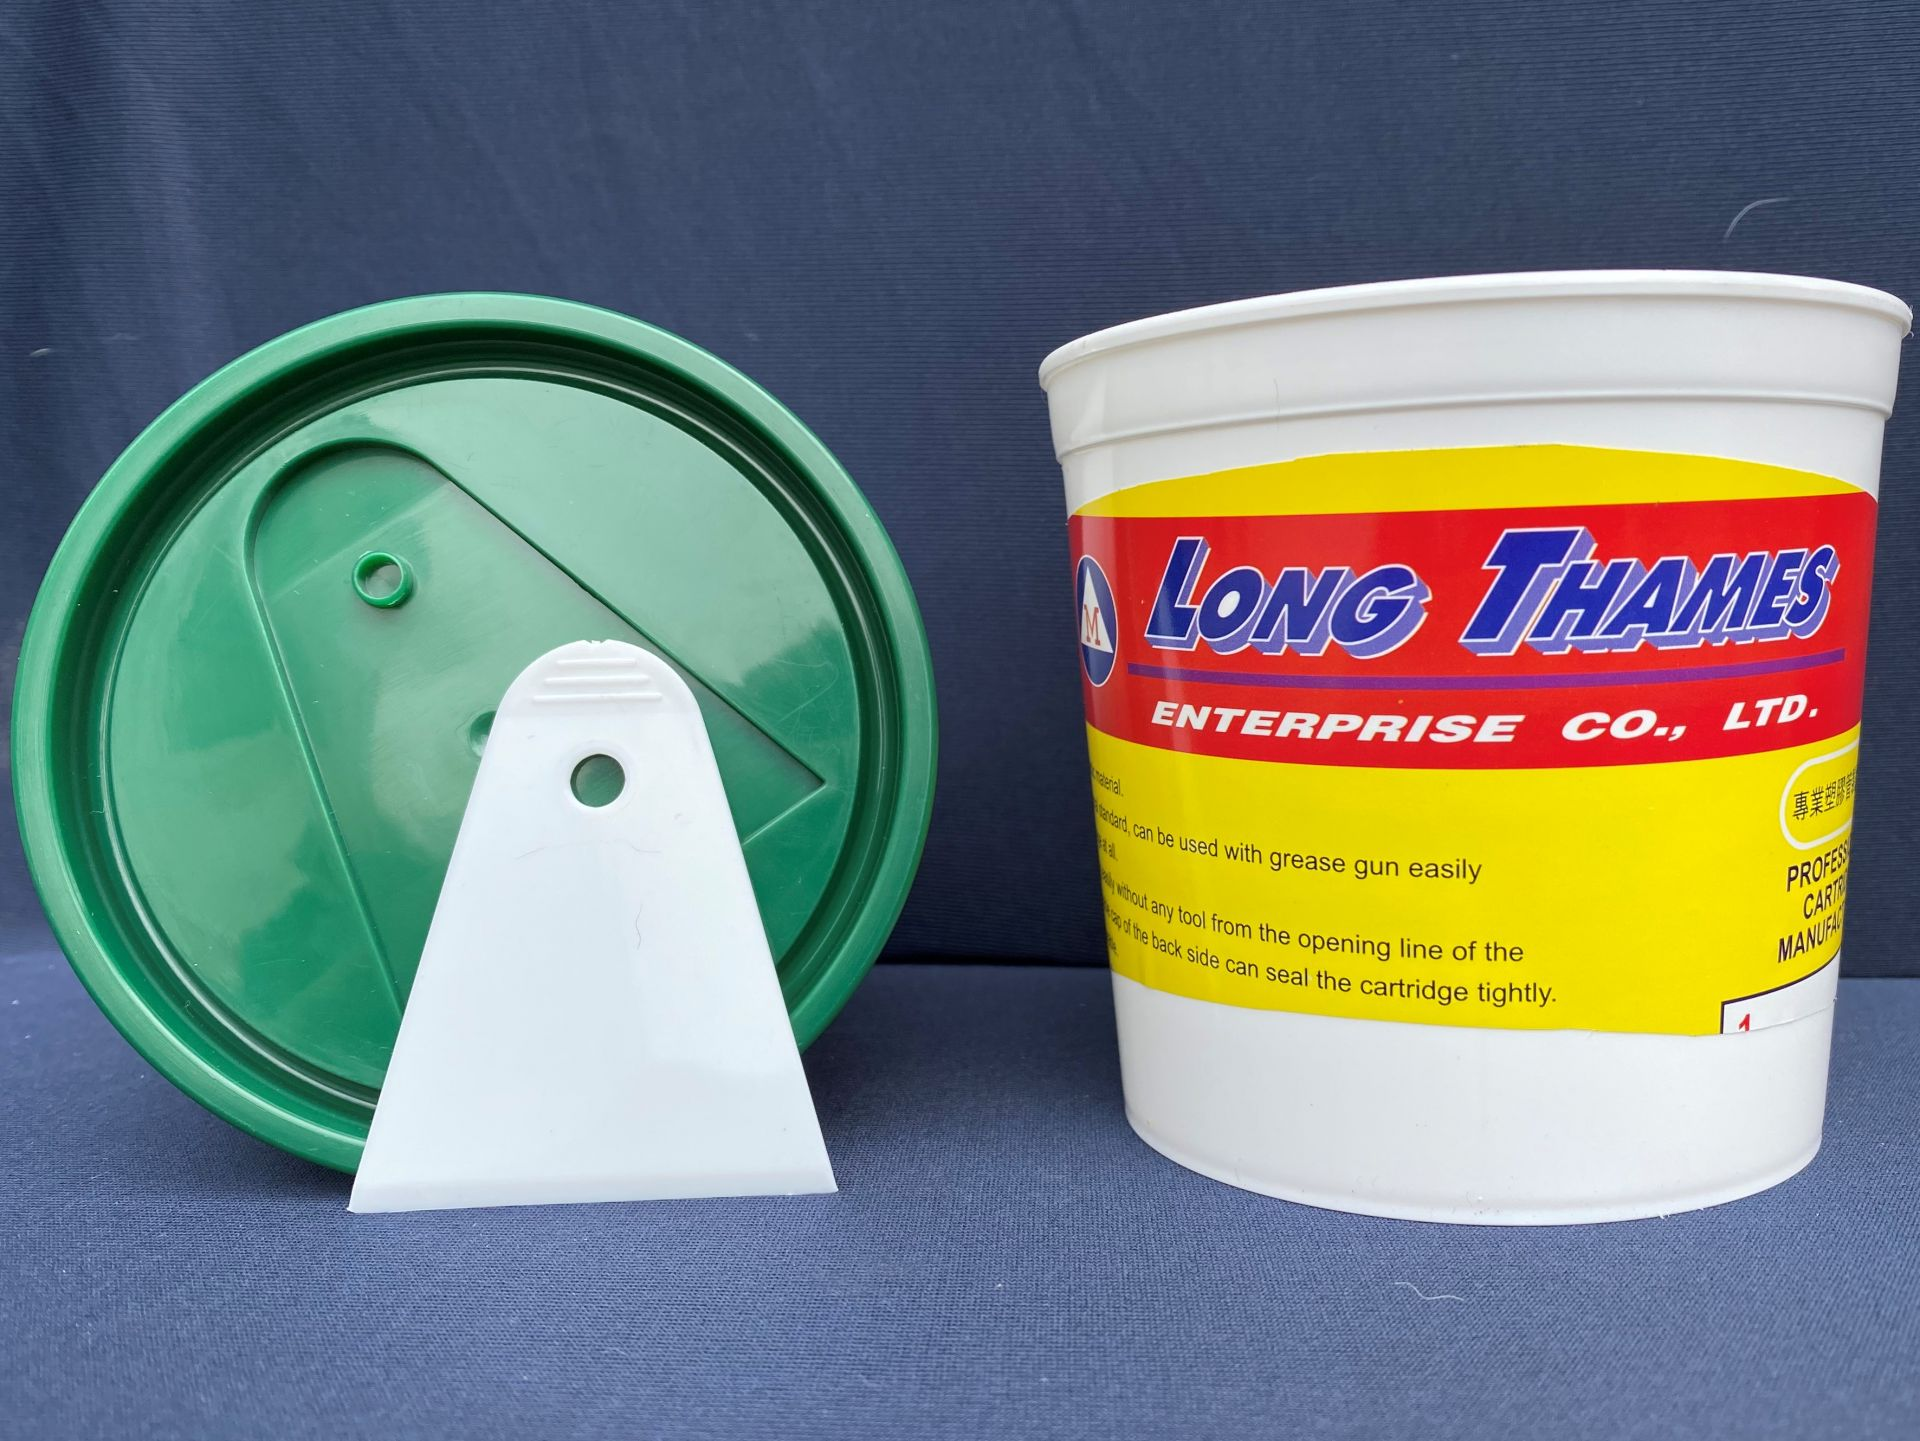 Volumen: 600 ml / 0,6 L, HDPE, crapper blanco, tapón verde, lata blanca